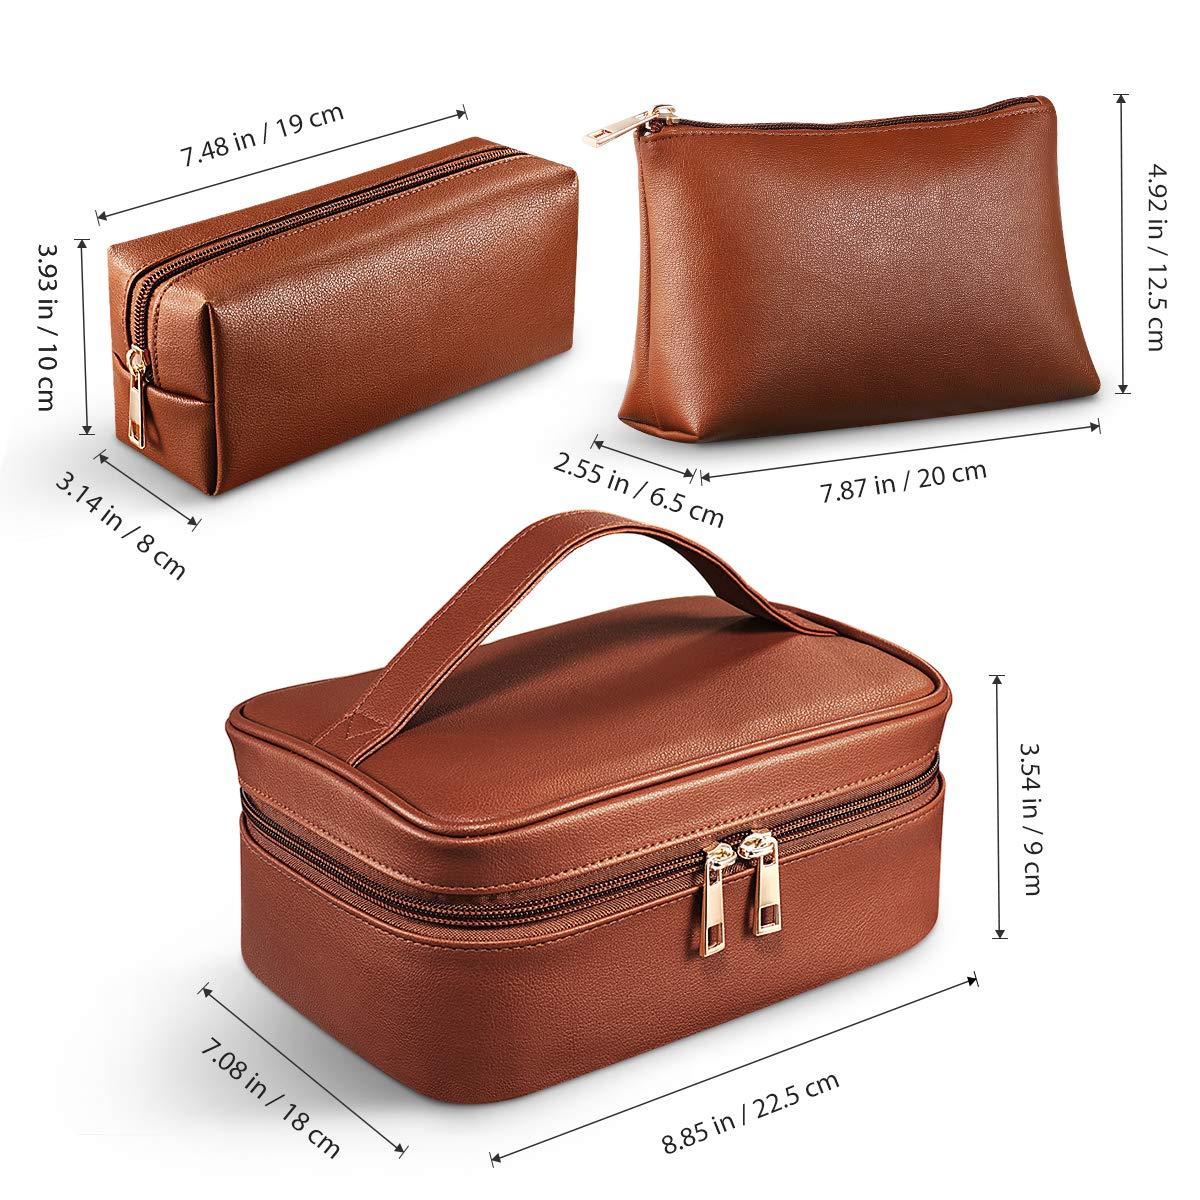 Makeup Bags, Cosmetic Bag 3 Packs Travel Makeup Bag Portable Makeup Bag Organizer